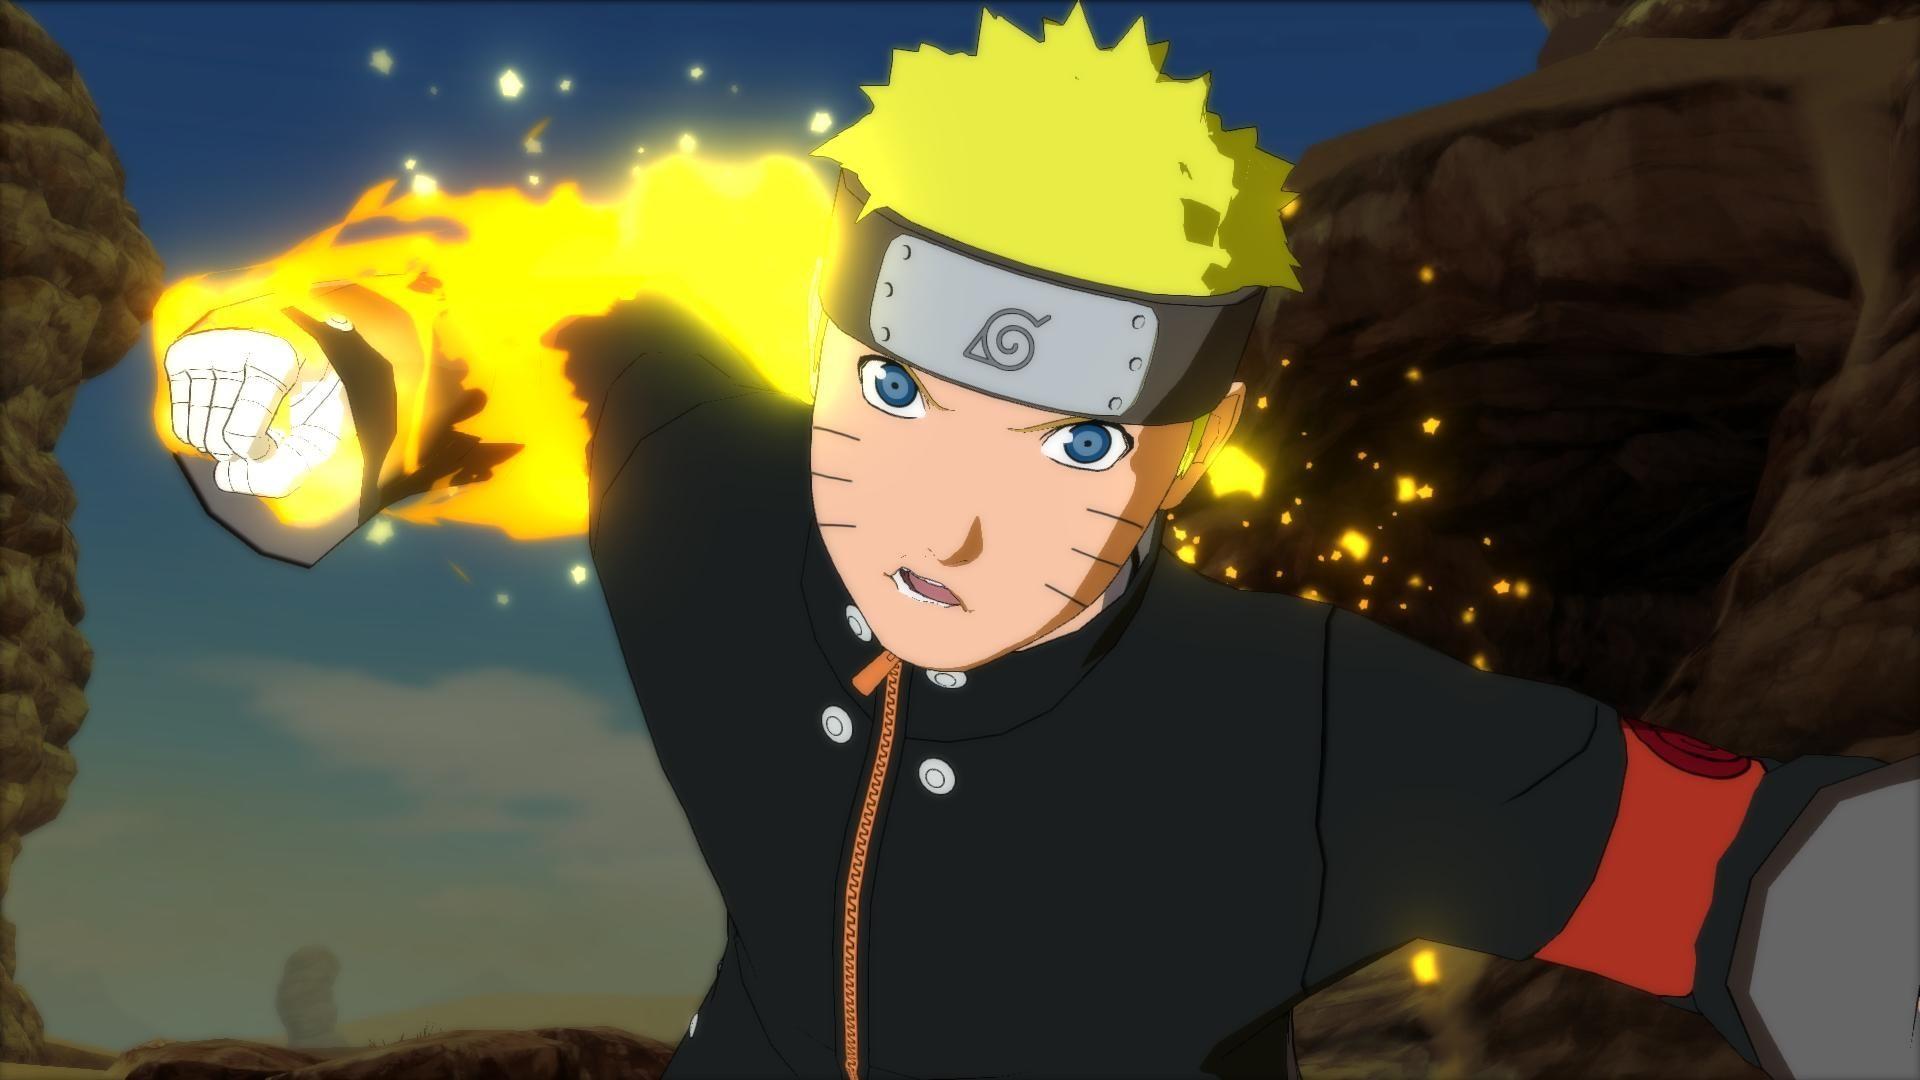 Naruto Shippuden Wallpaper Hd 1080p Naruto Shippuden Hd Wallpaper 65 Images